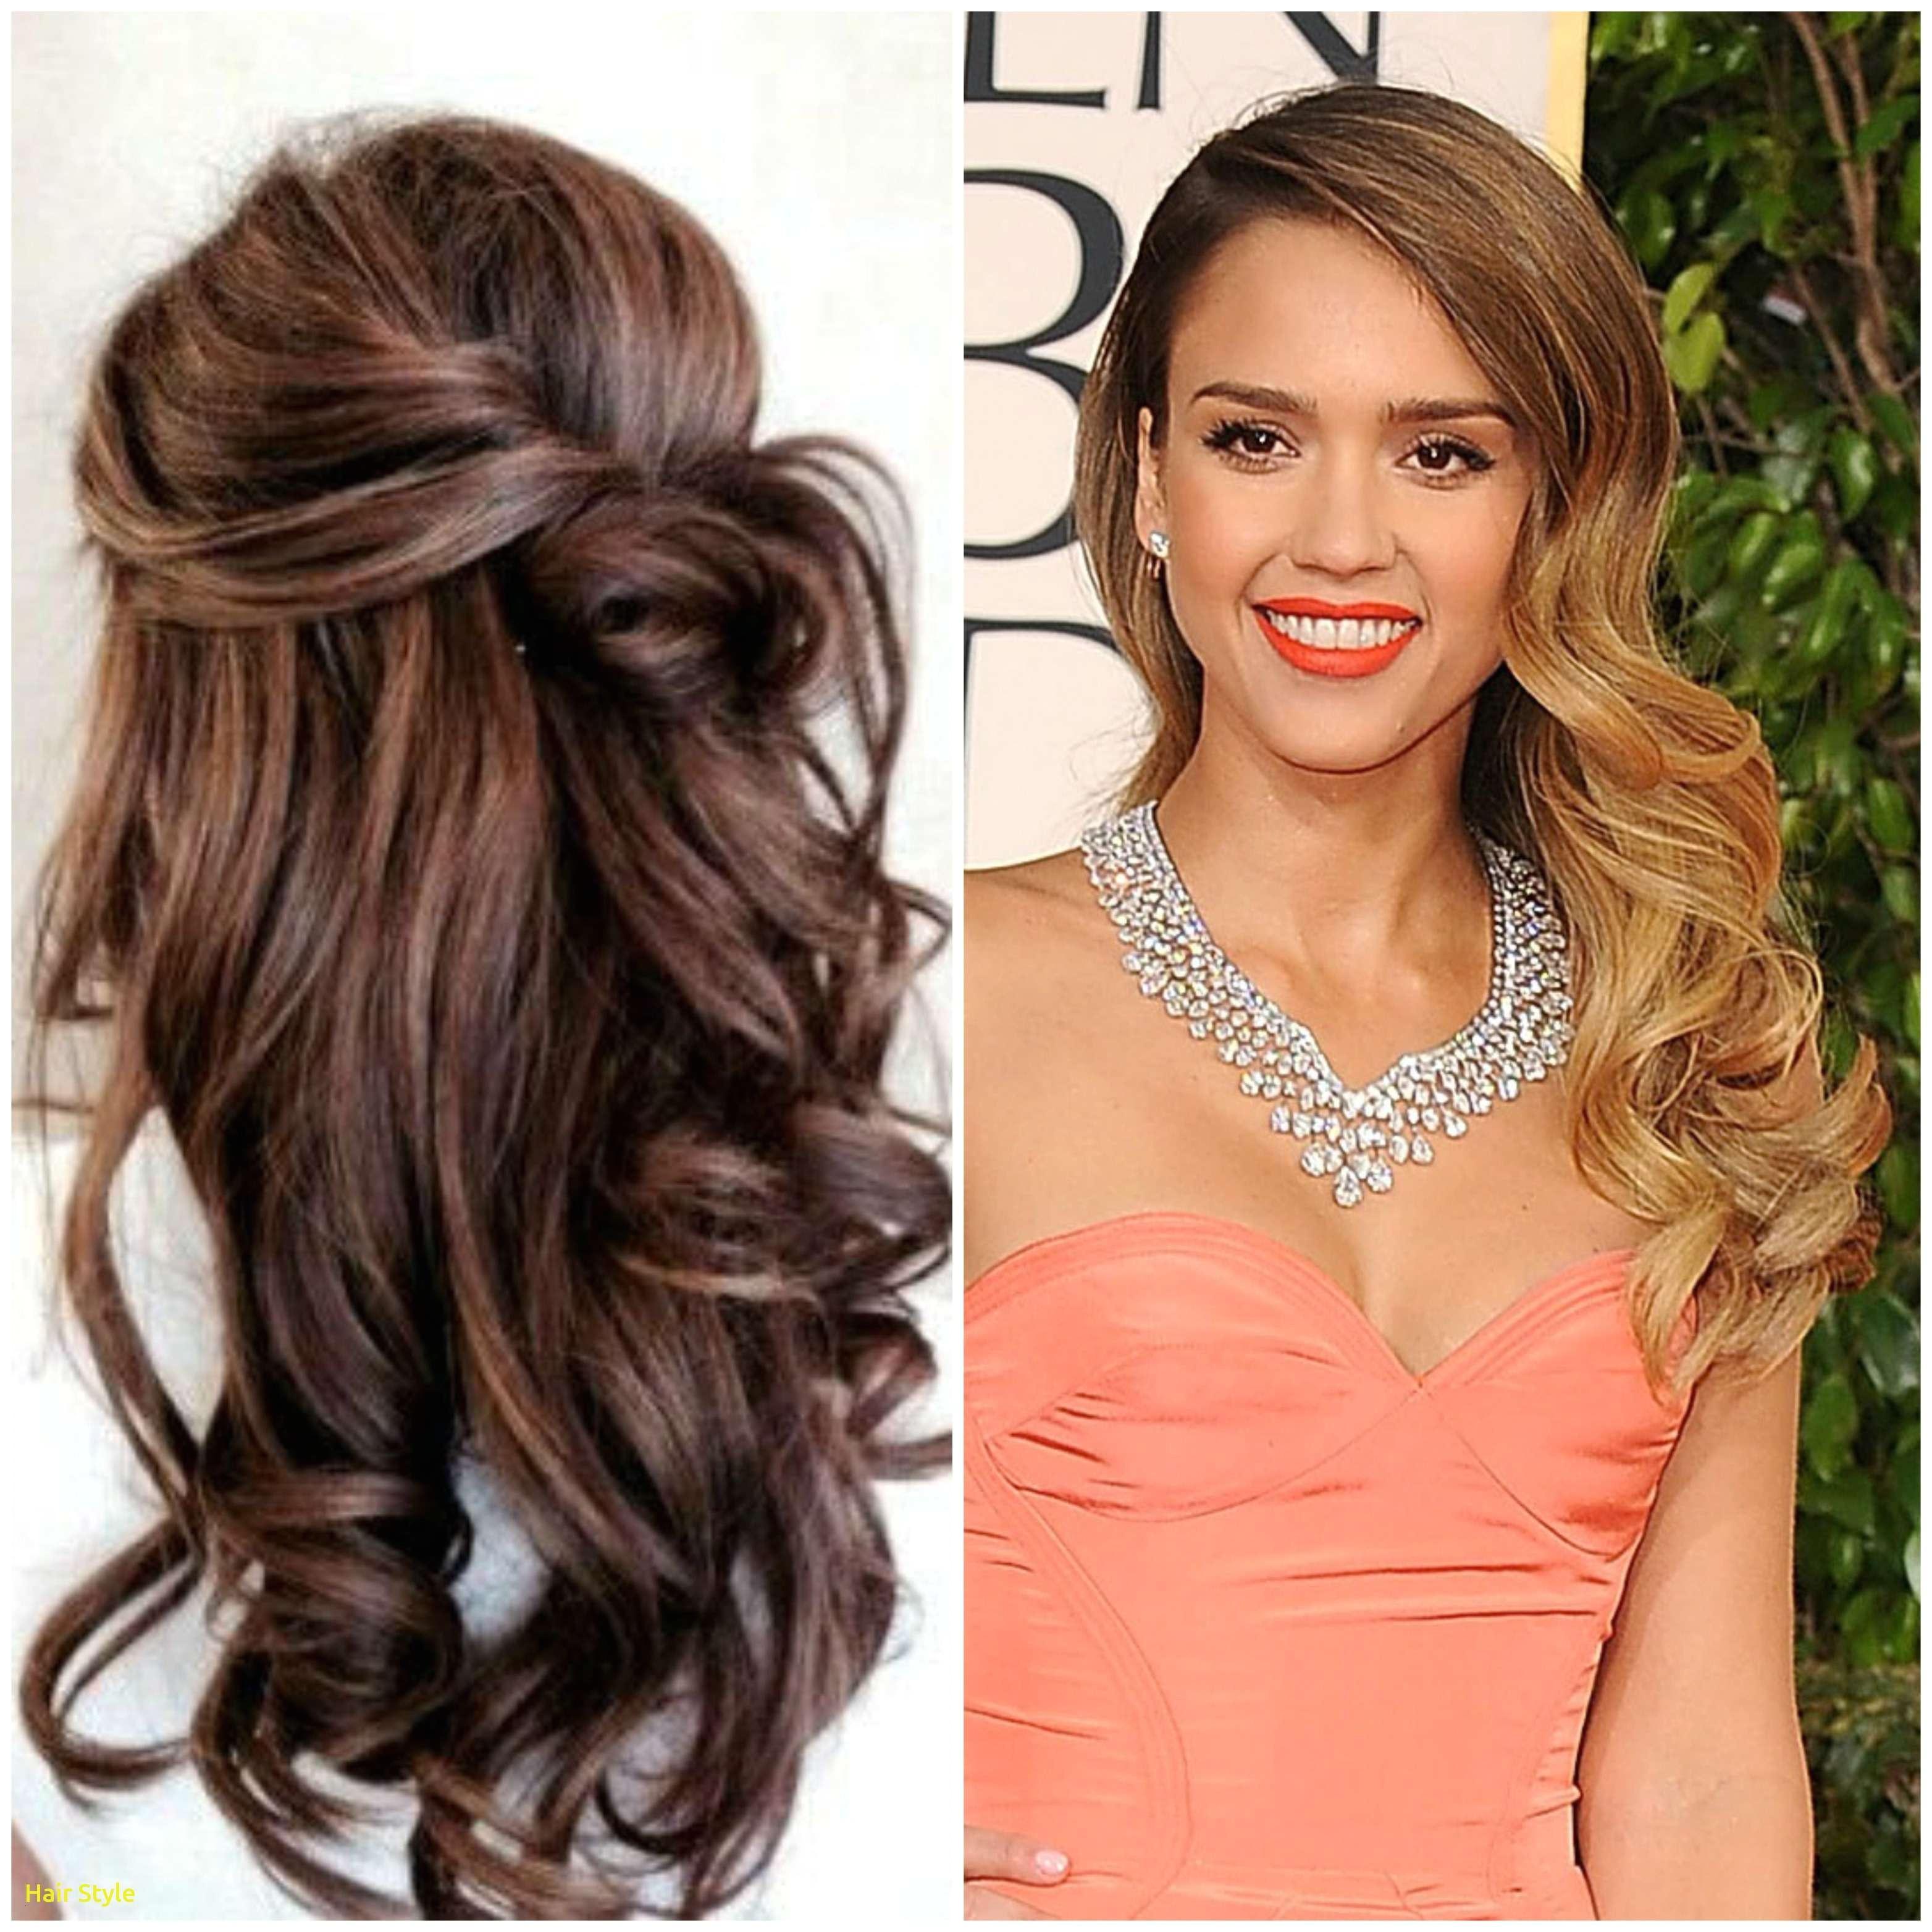 Different Hairstyles Girls Best New Different Hairstyles for Girls with Names Ideas Different